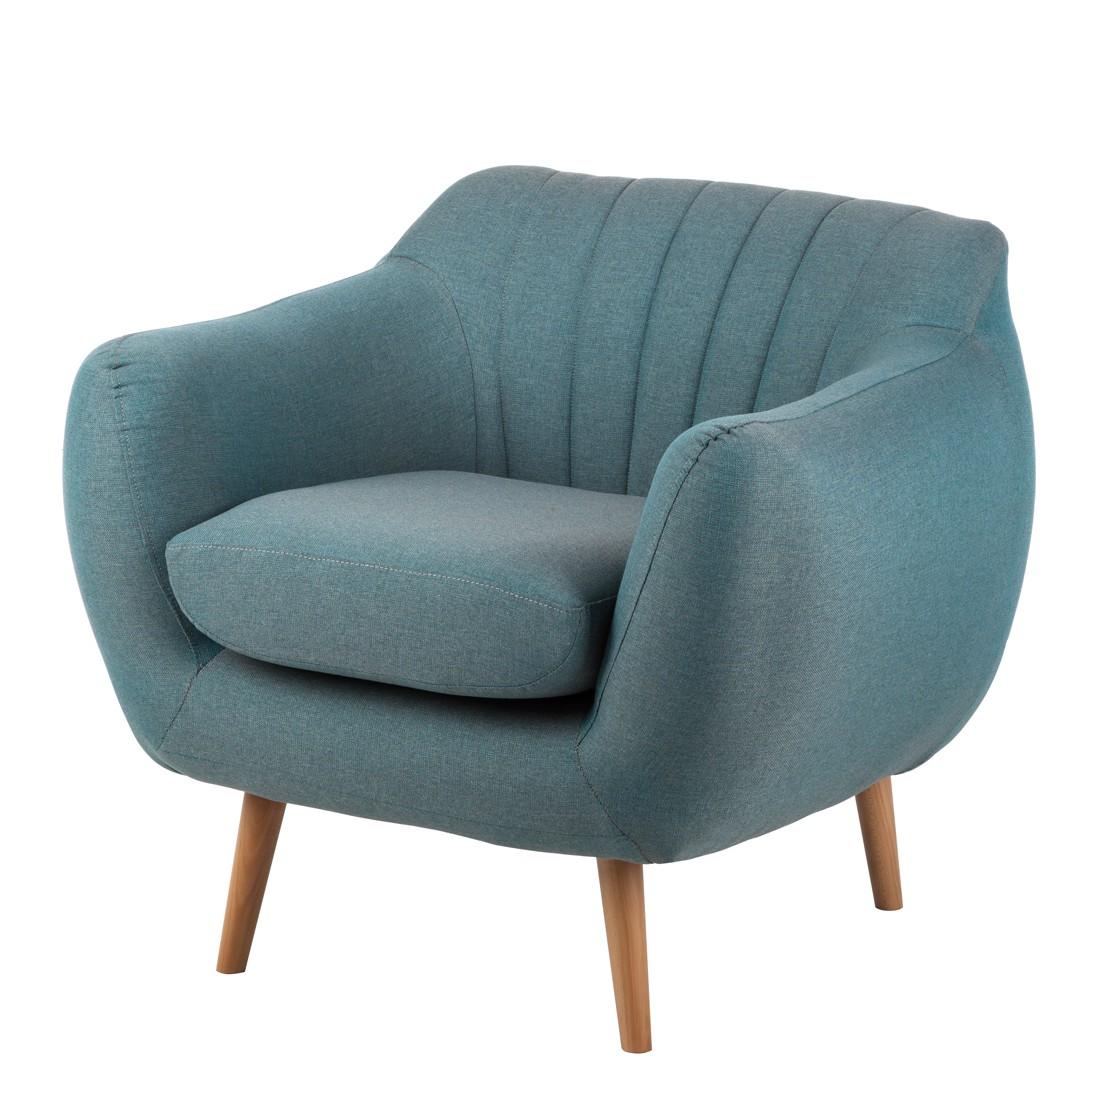 Sessel Molly – Webstoff Blaugrau, Mørteens günstig